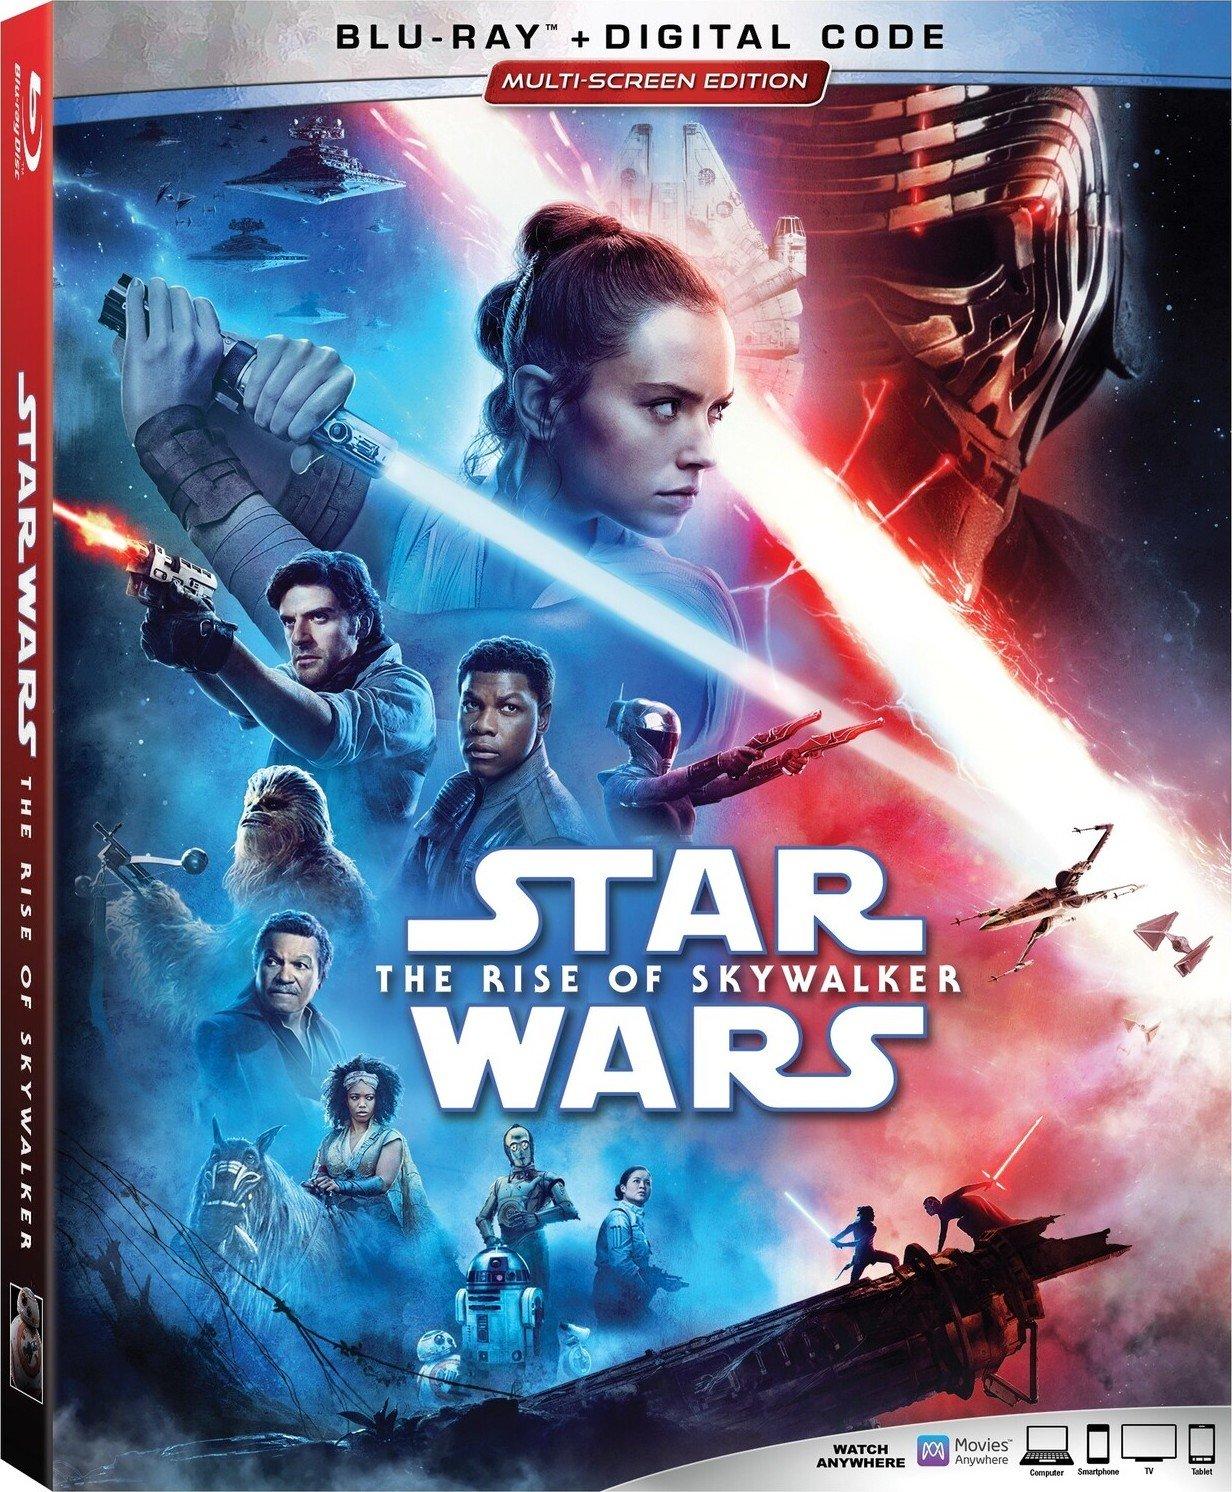 Star Wars: Episode IX - The Rise of Skywalker aka Star Wars: The Rise Of Skywalker (2019) poster image